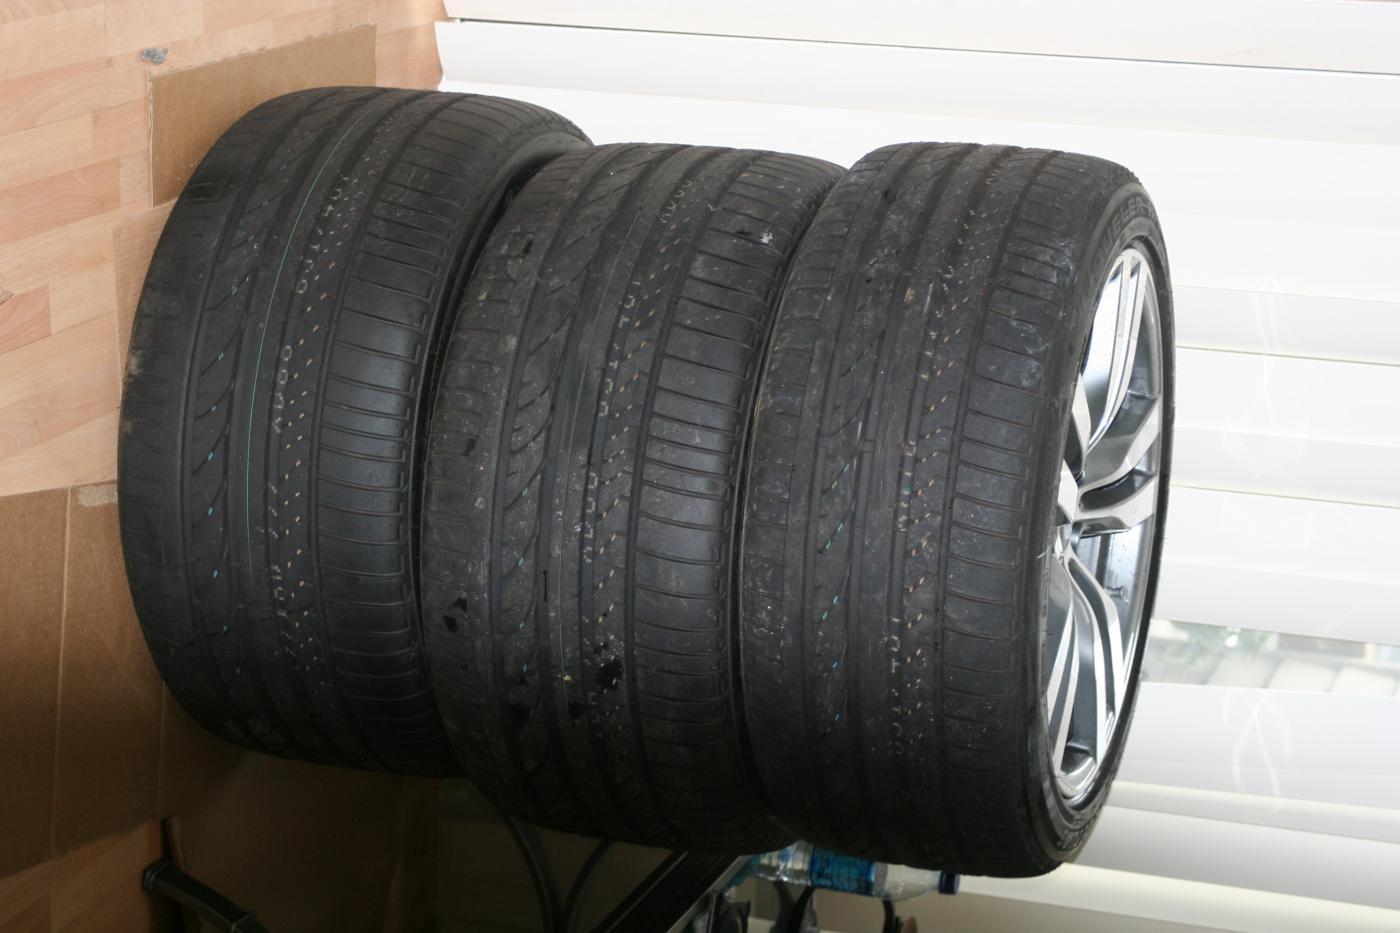 Bmw X6 M Oem Forged Performance Wheels Rft Tires Tpms